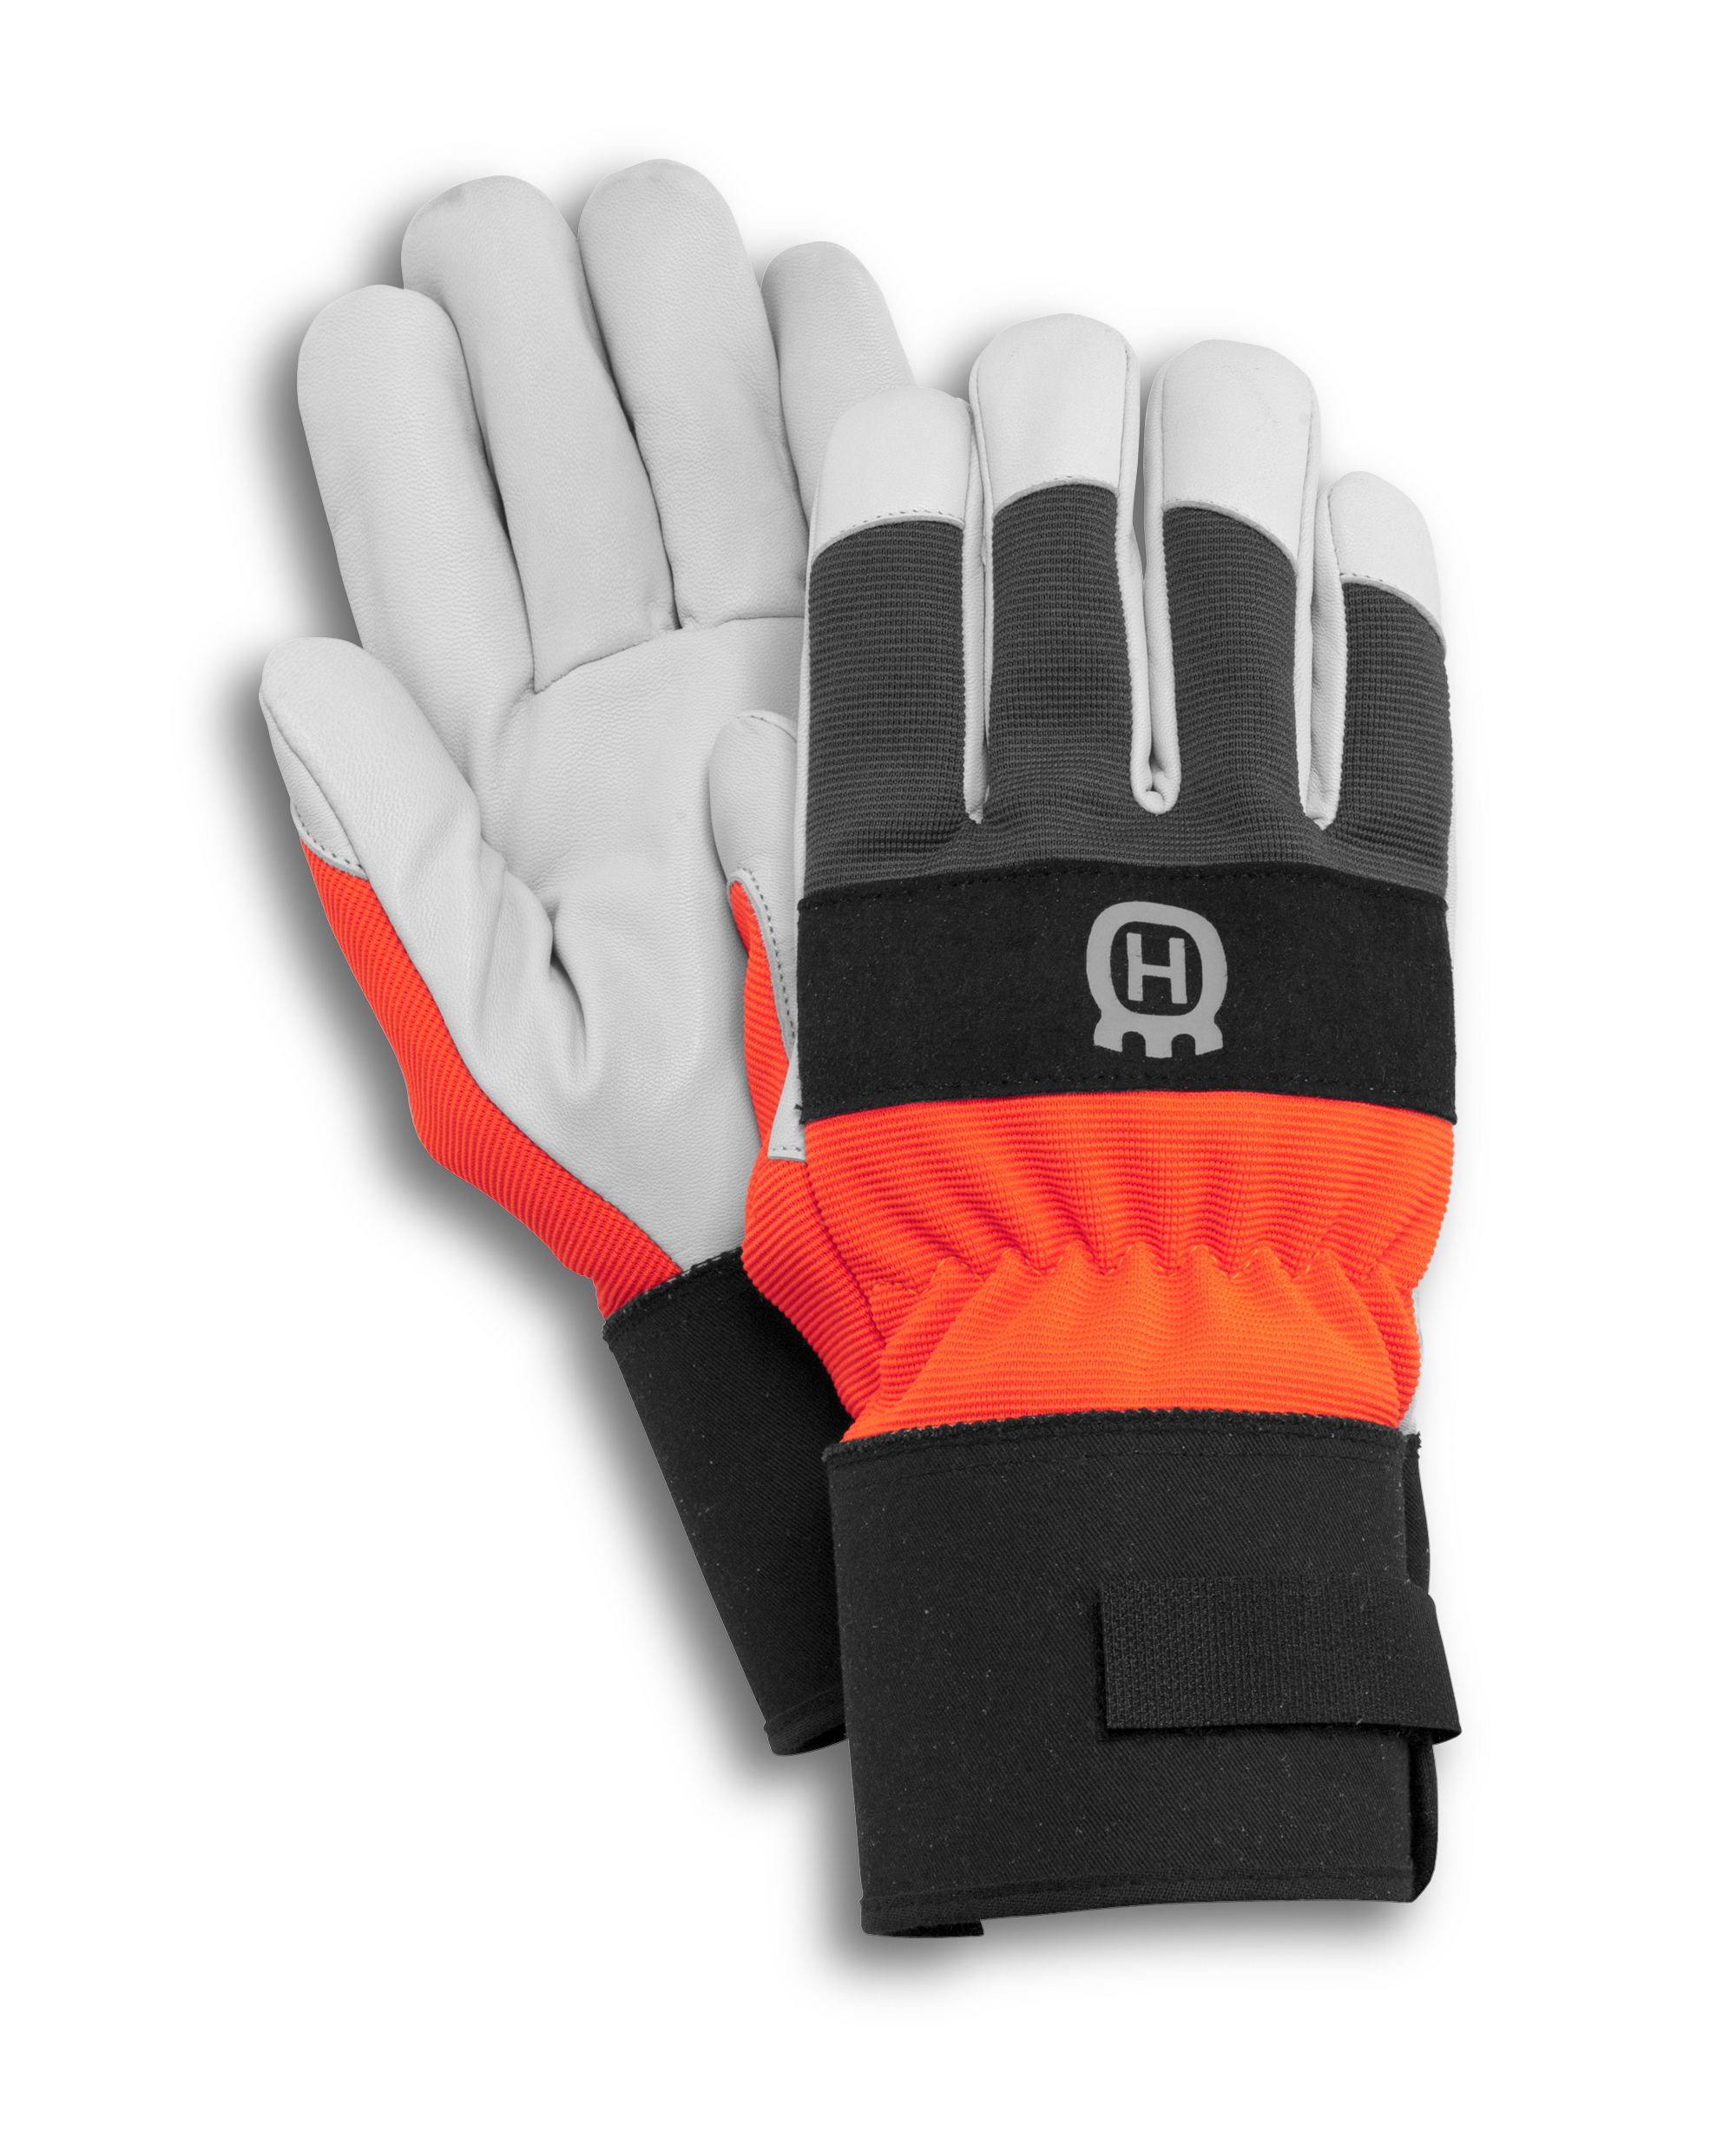 Husqvarna hd leather work. Gloves clipart golf glove